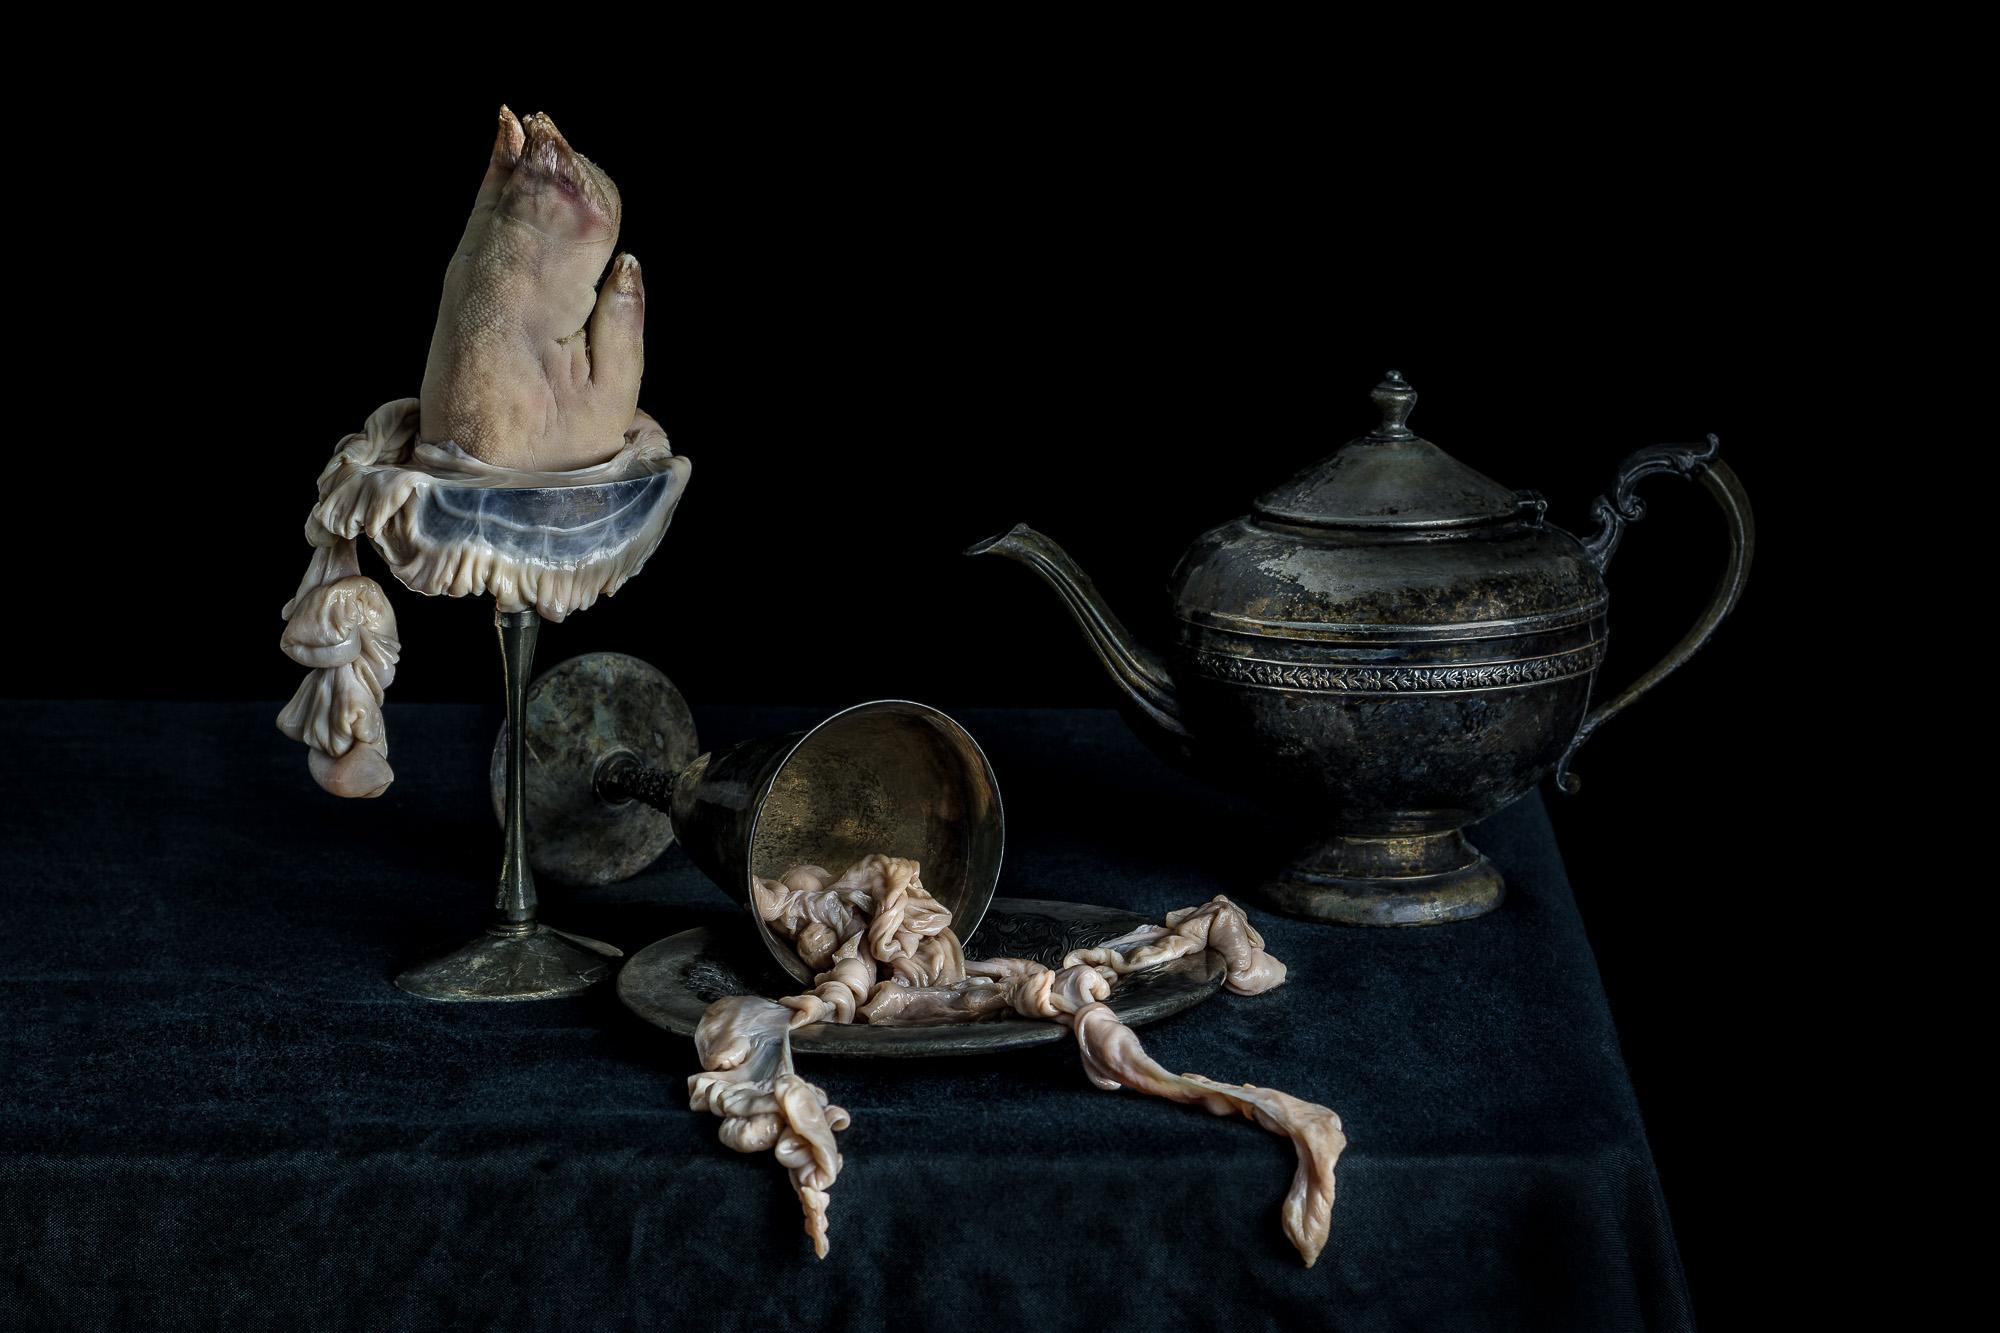 Vanitas with Pig Foot, Pig Intestines, and Teapot